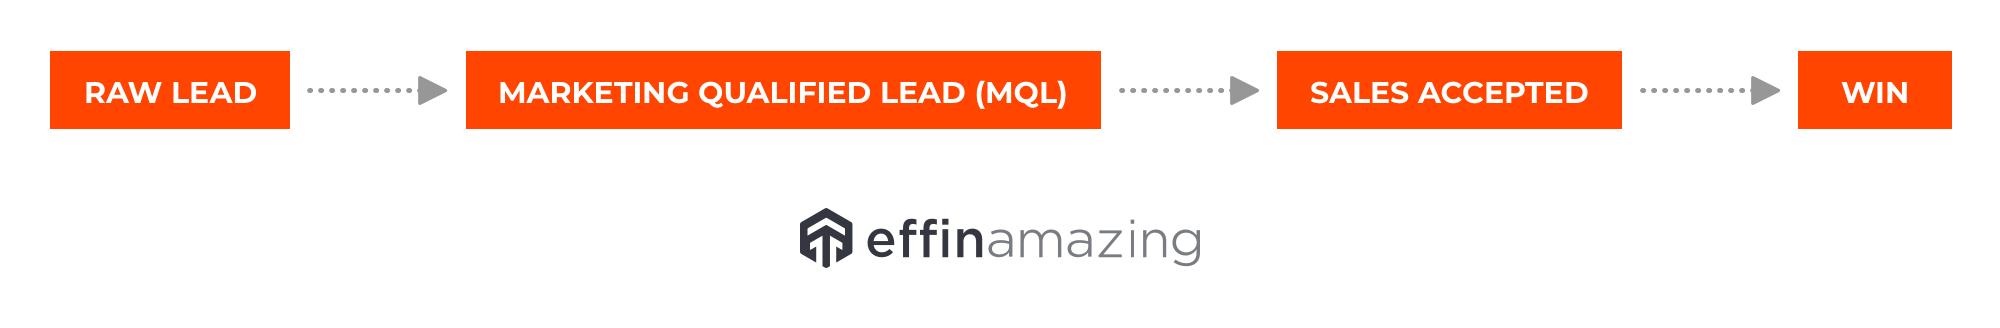 marketing qualified lead MQL definition